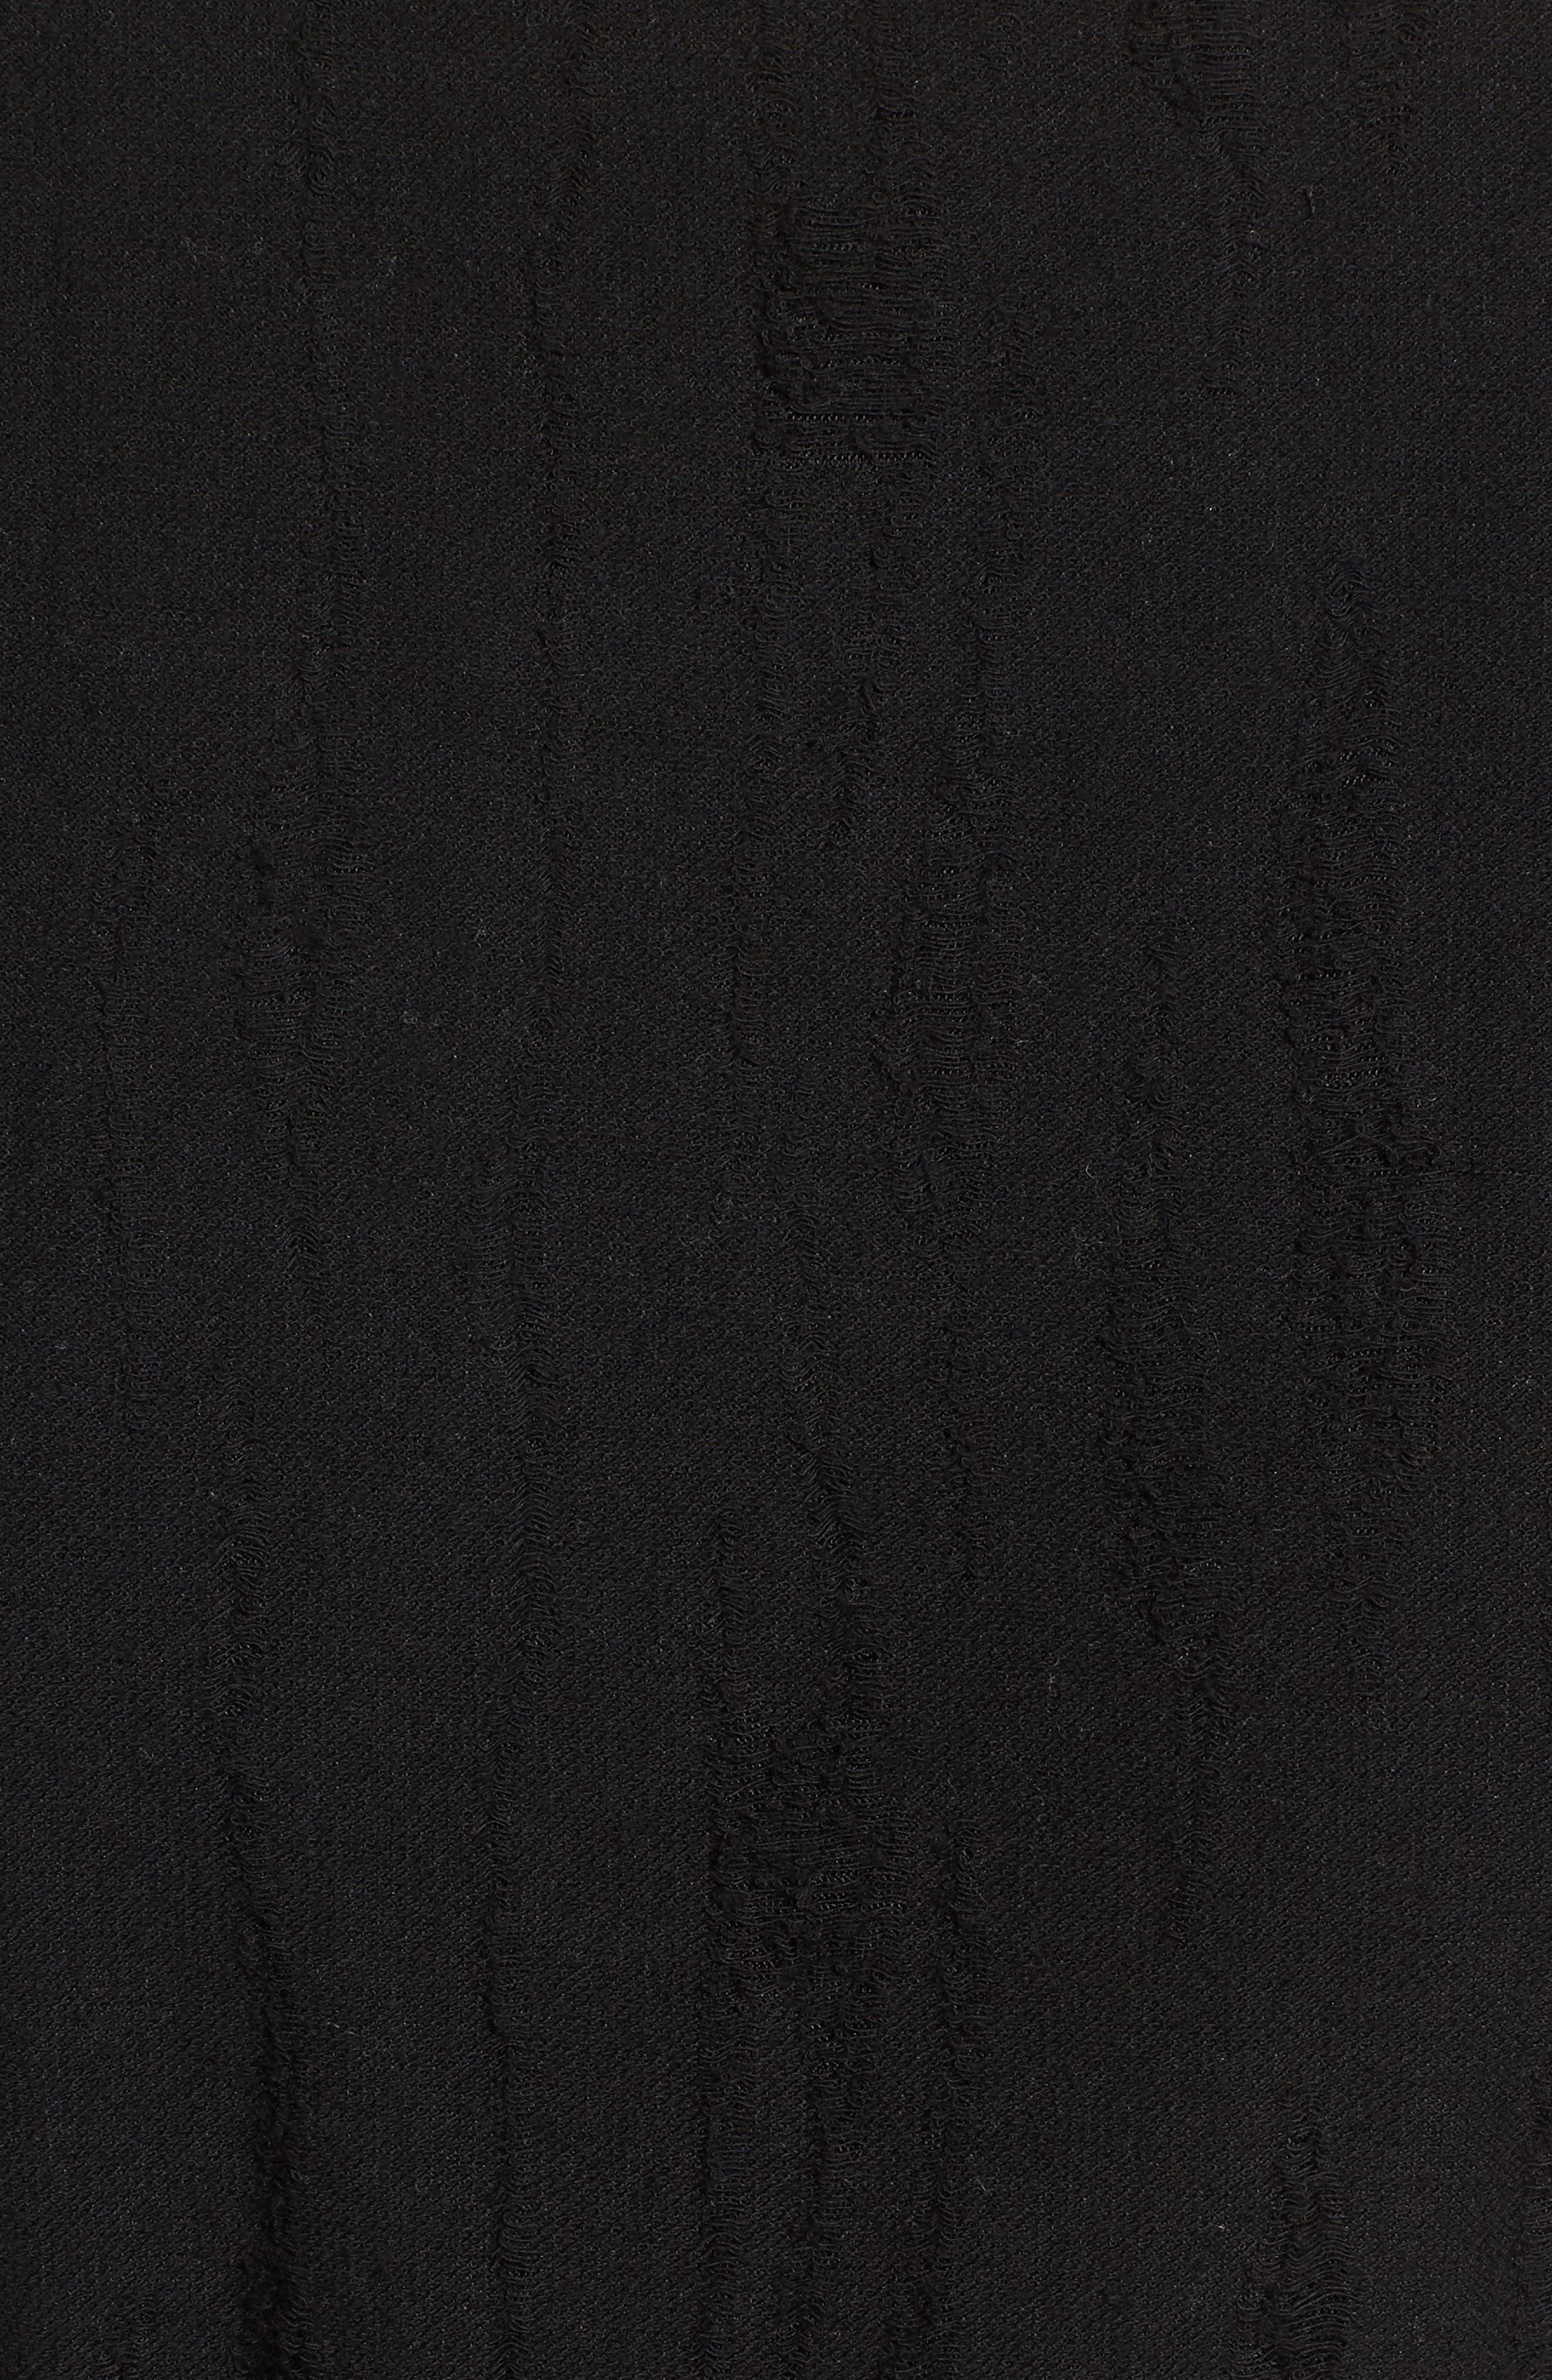 Ruffle Edge Dress,                             Alternate thumbnail 5, color,                             001